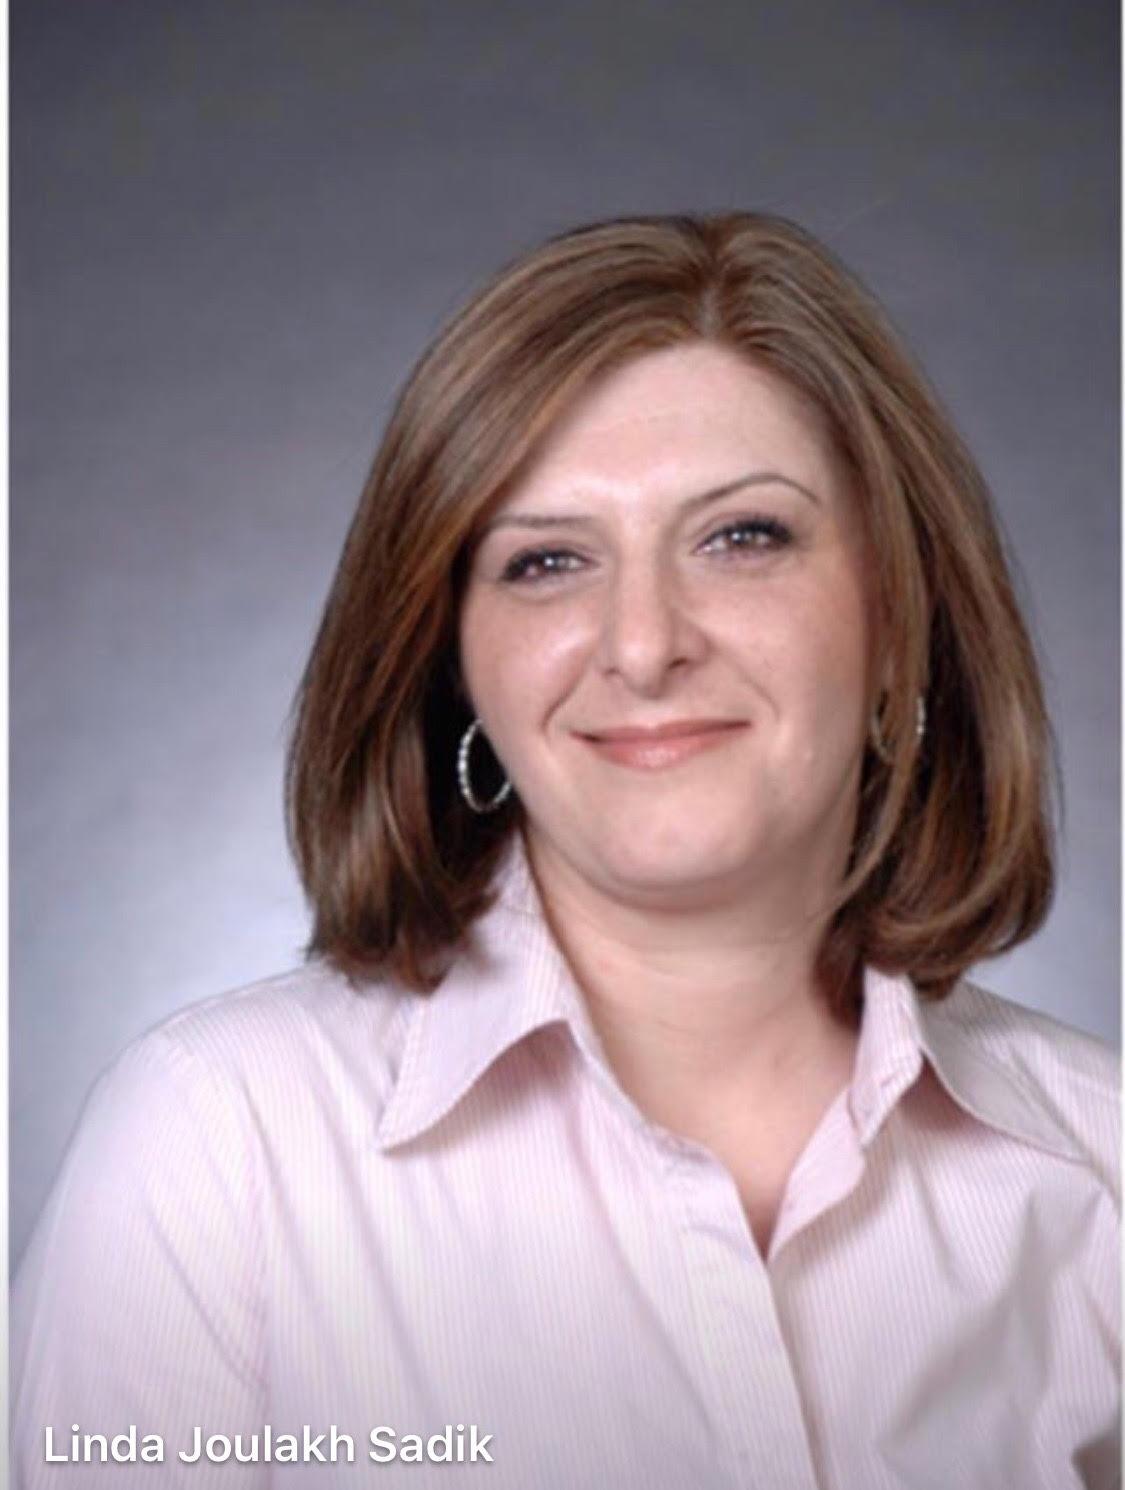 Linda Sadik, Rochester Hills, 51